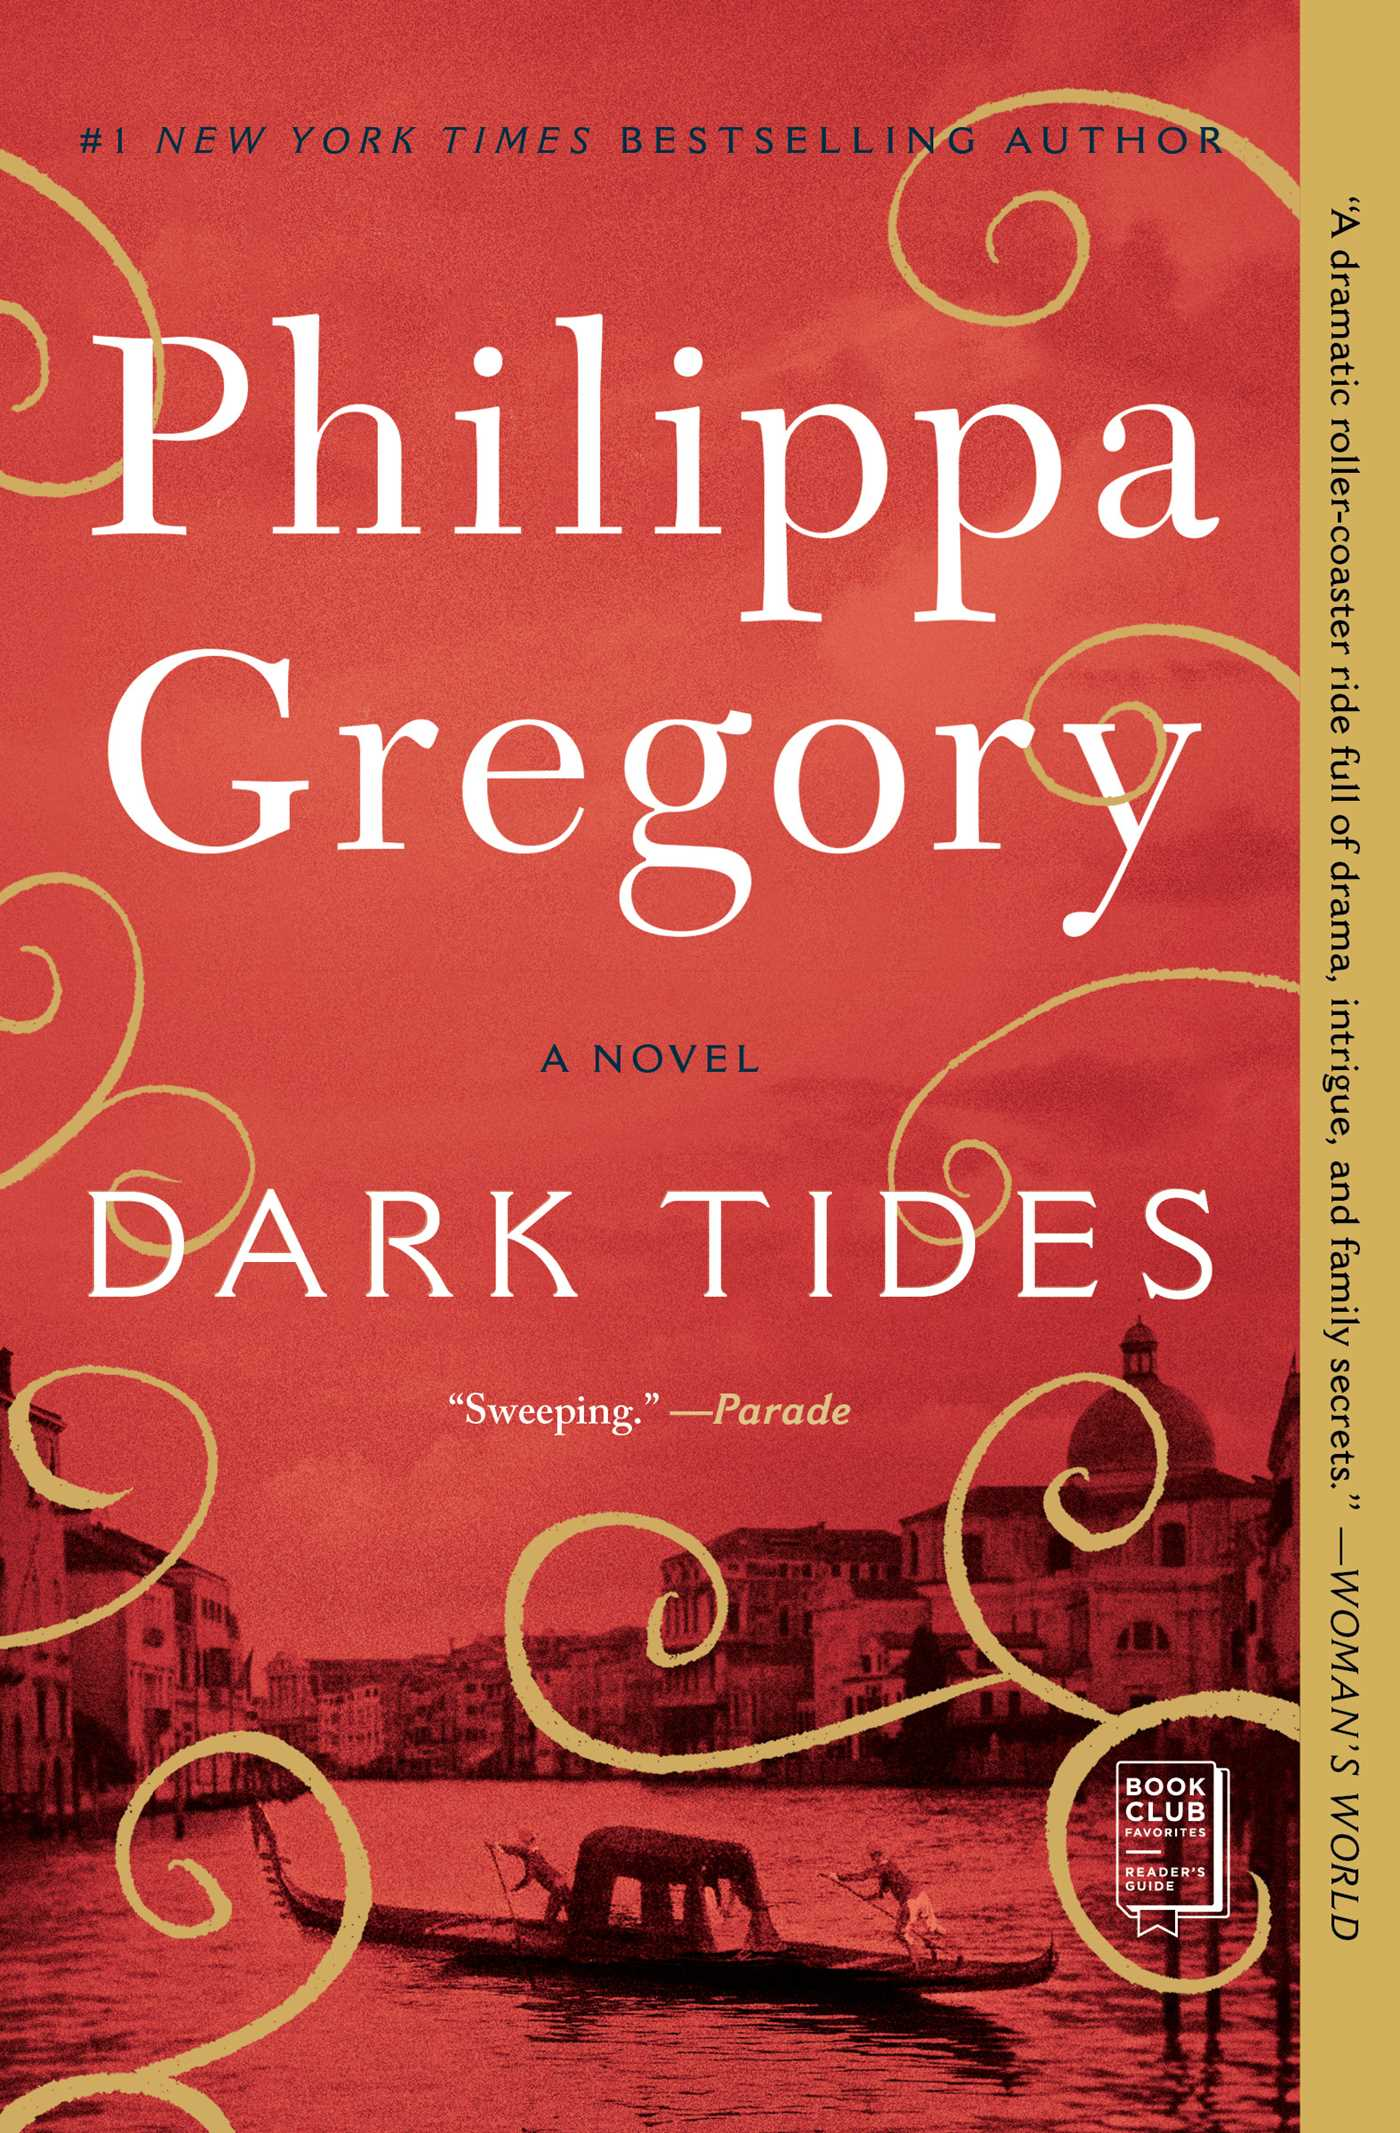 Dark Tides cover image